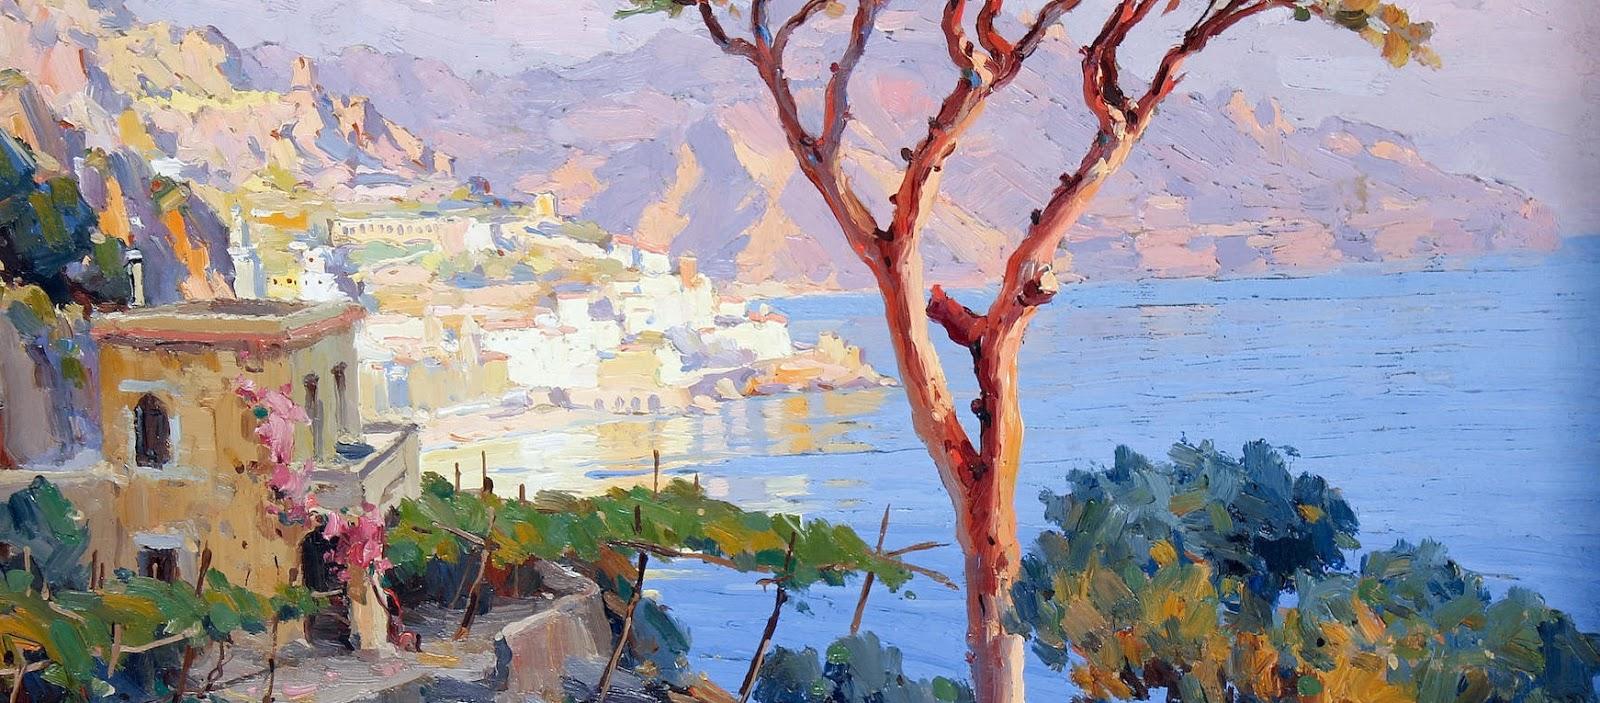 Albino Luca The Amalfi coast